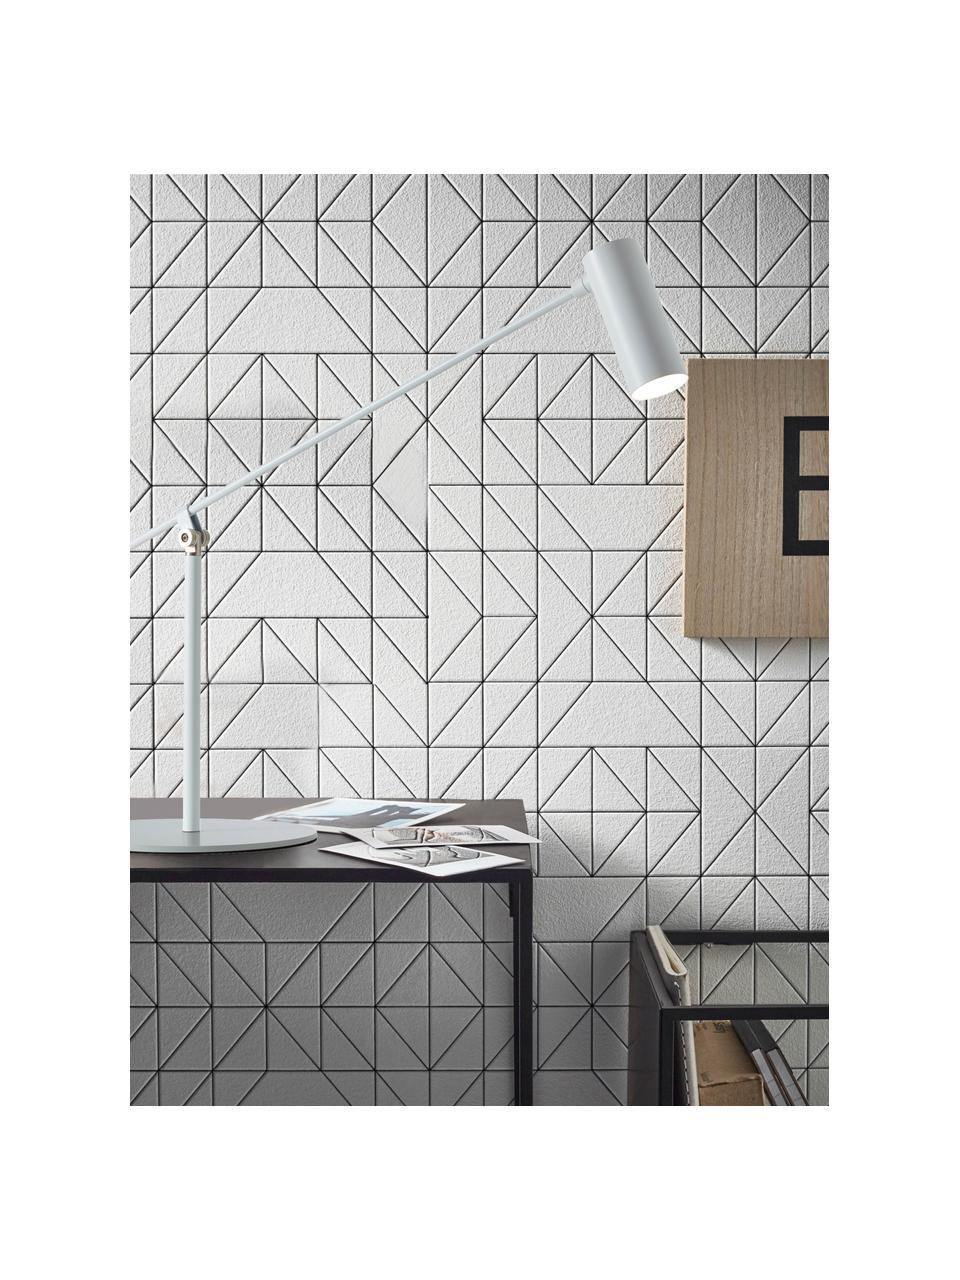 Große LED-Schreibtischlampe Wova, Lampenschirm: Metall, beschichtet, Lampenfuß: Metall, beschichtet, Dekor: Metall, Weiß, 20 x 74 cm